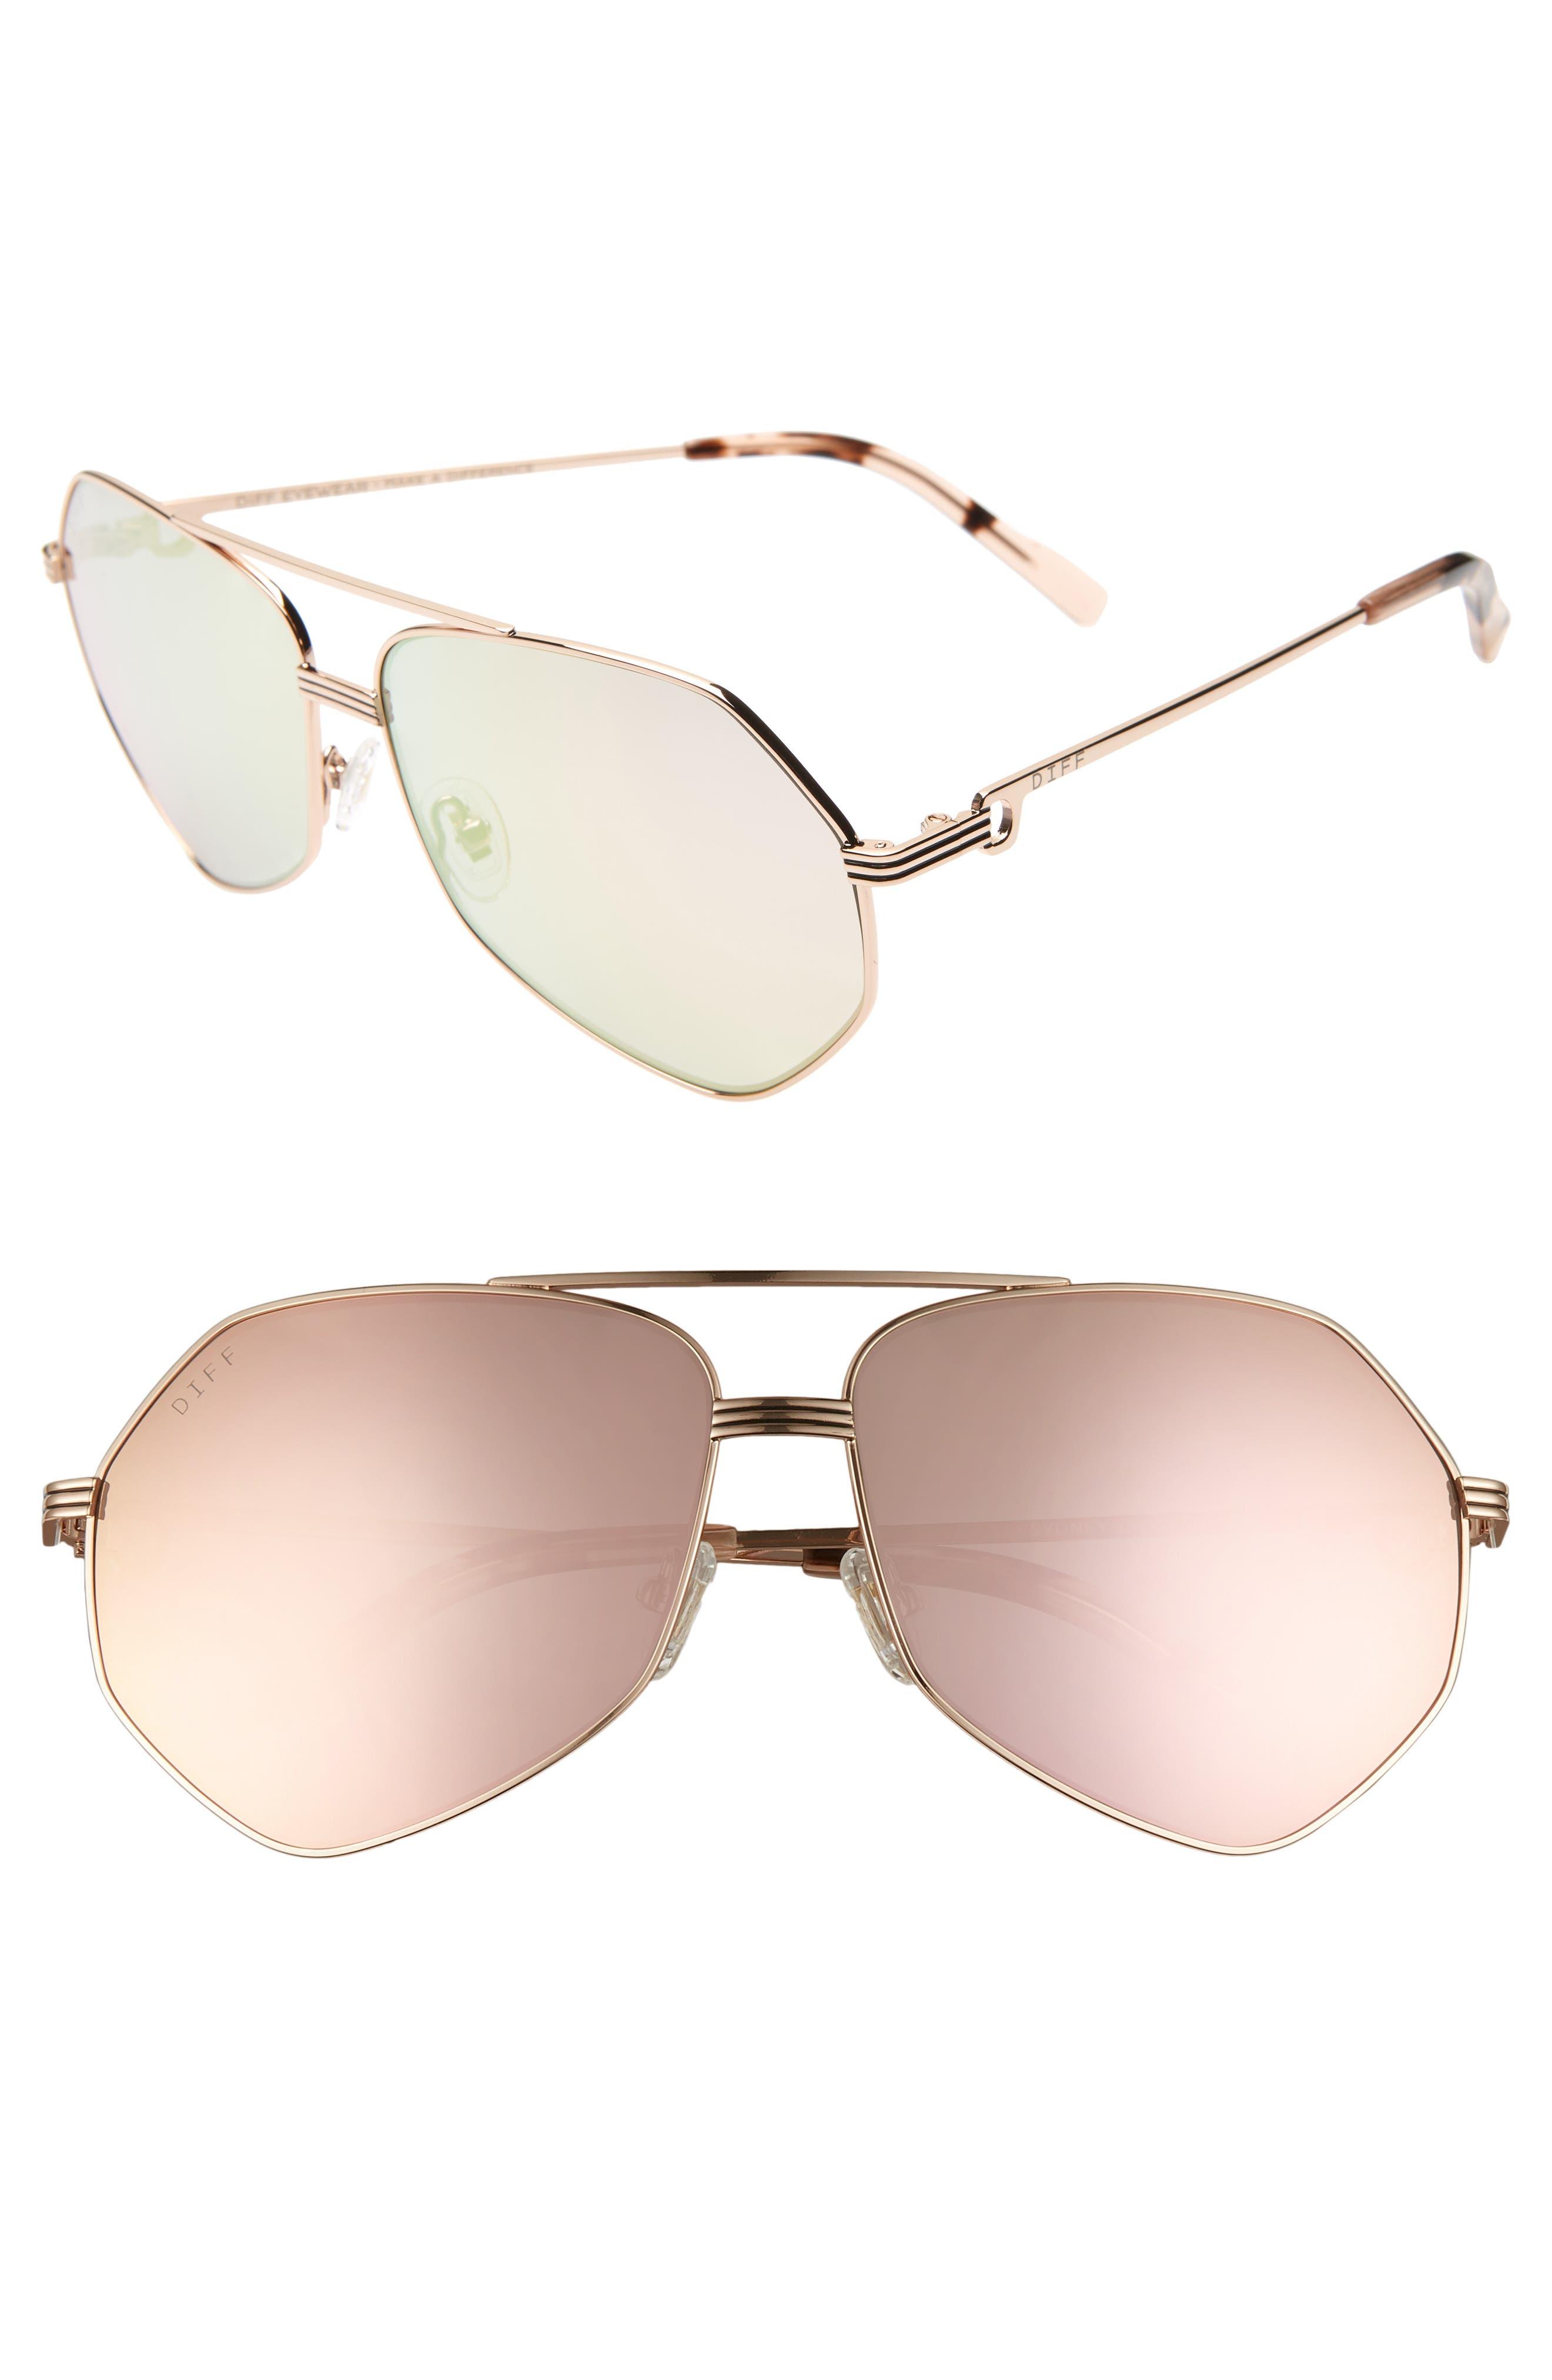 Sydney 62mm Polarized Aviator Sunglasses,                             Main thumbnail 1, color,                             GOLD/ HIMALAYAN/ CHAMPAGNE